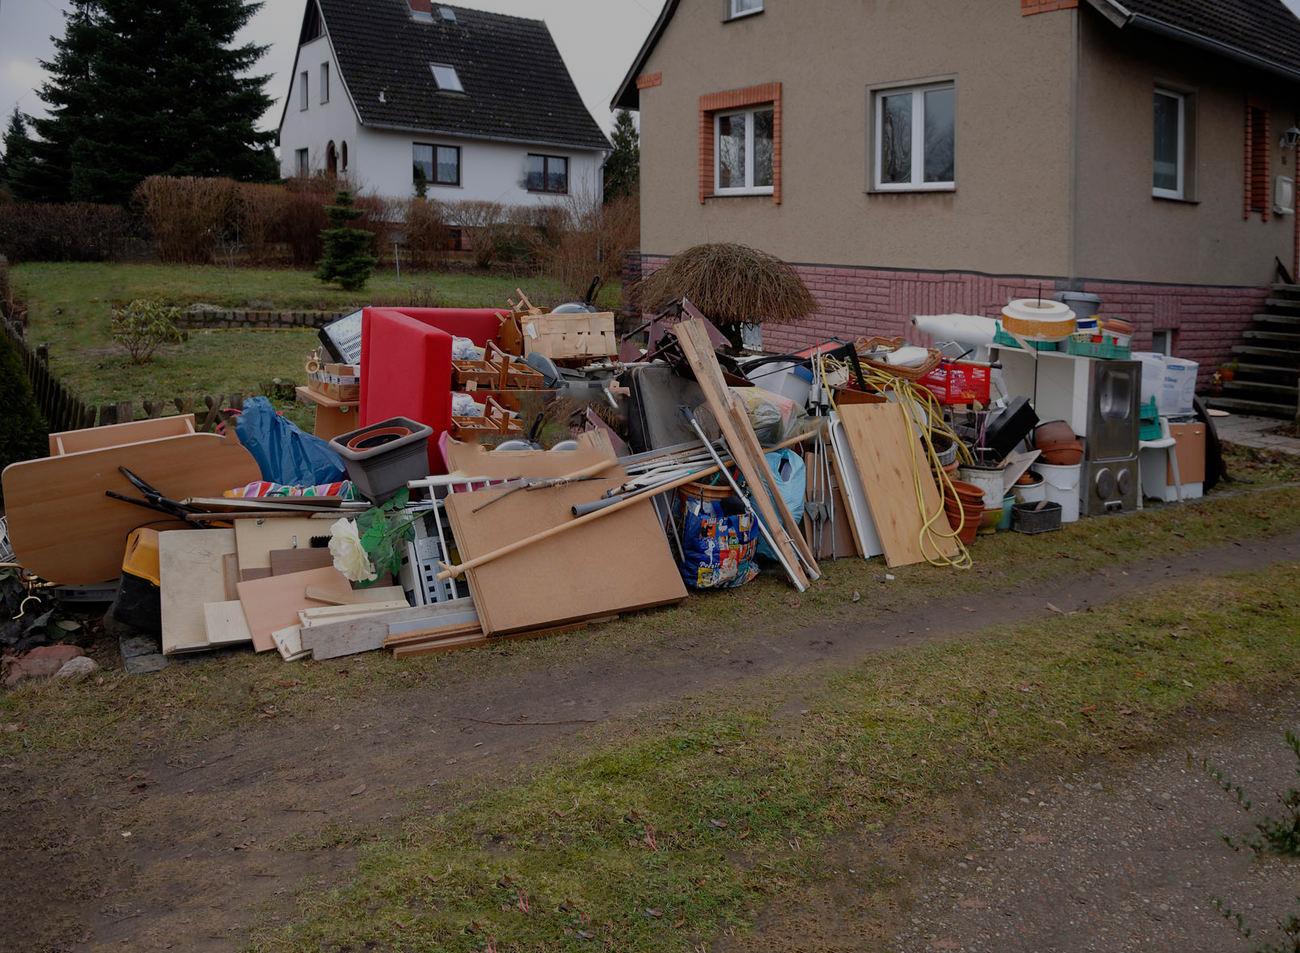 junk removal service near me